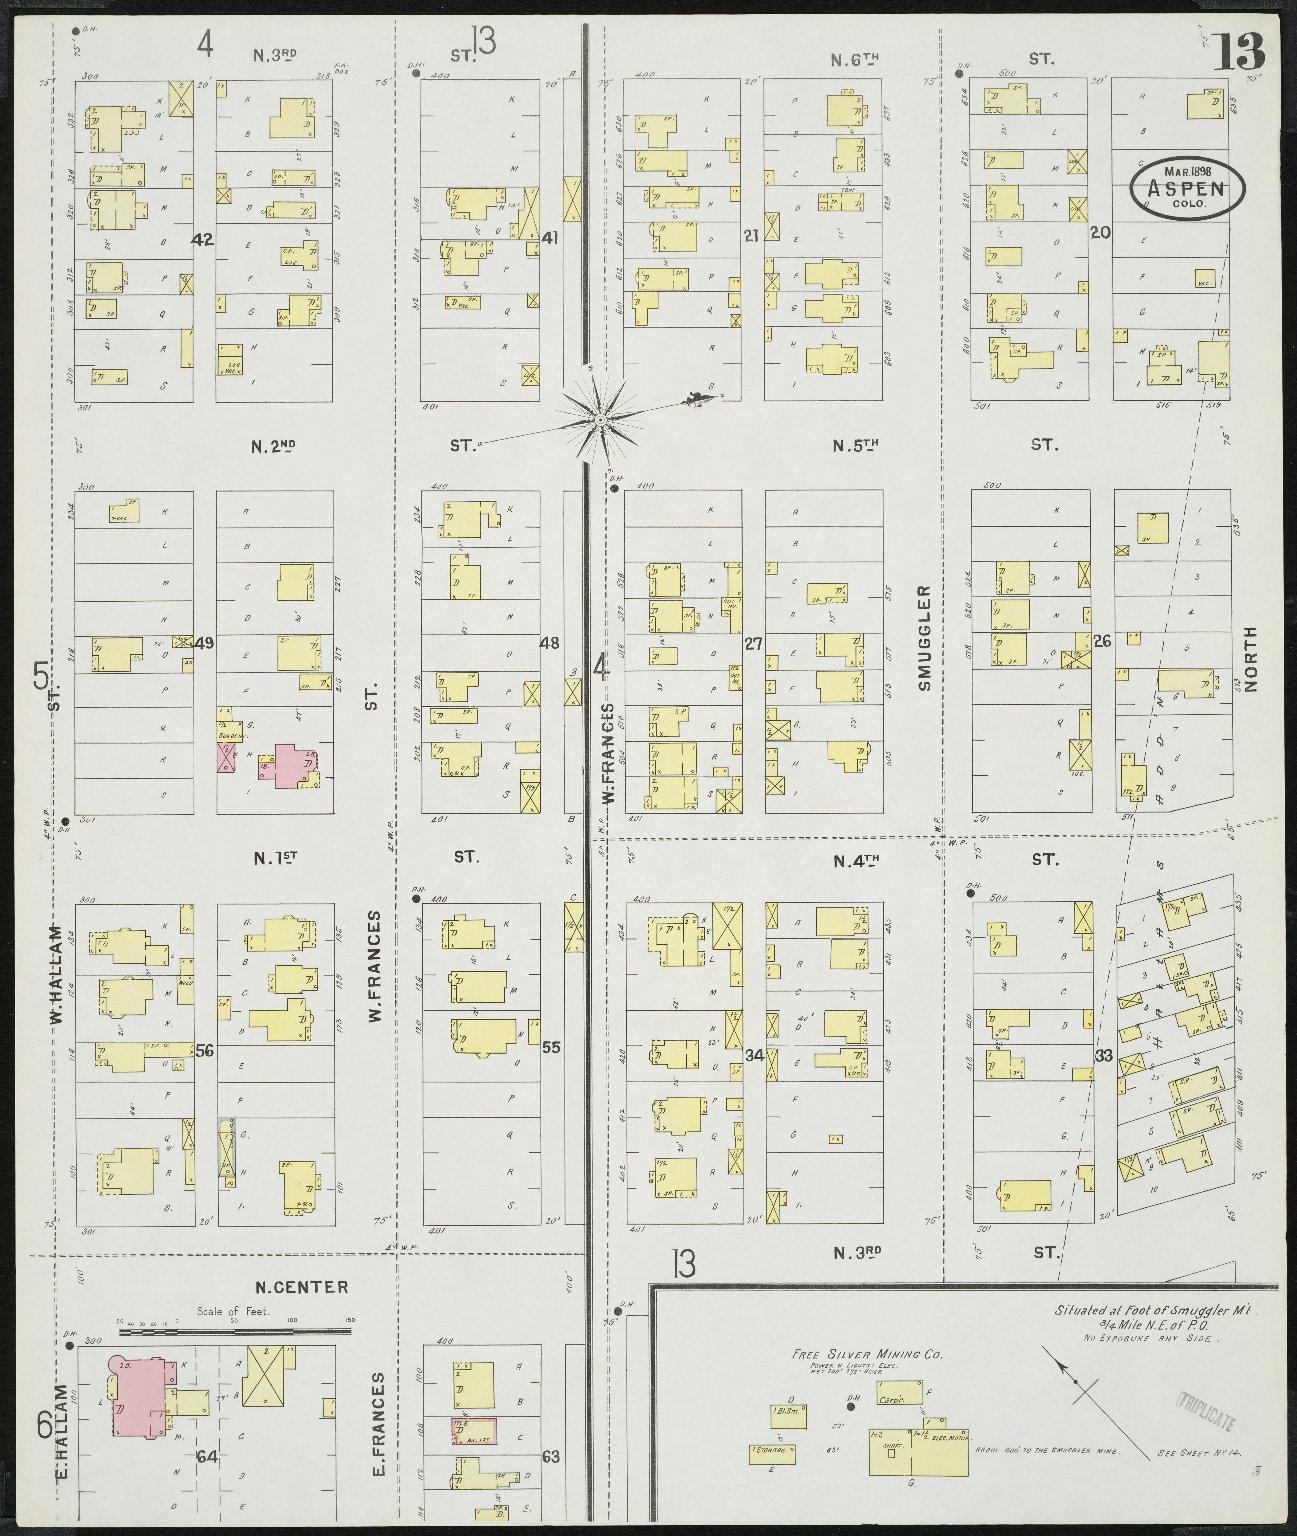 Insurance maps of Aspen, Pitkin Co., Colorado